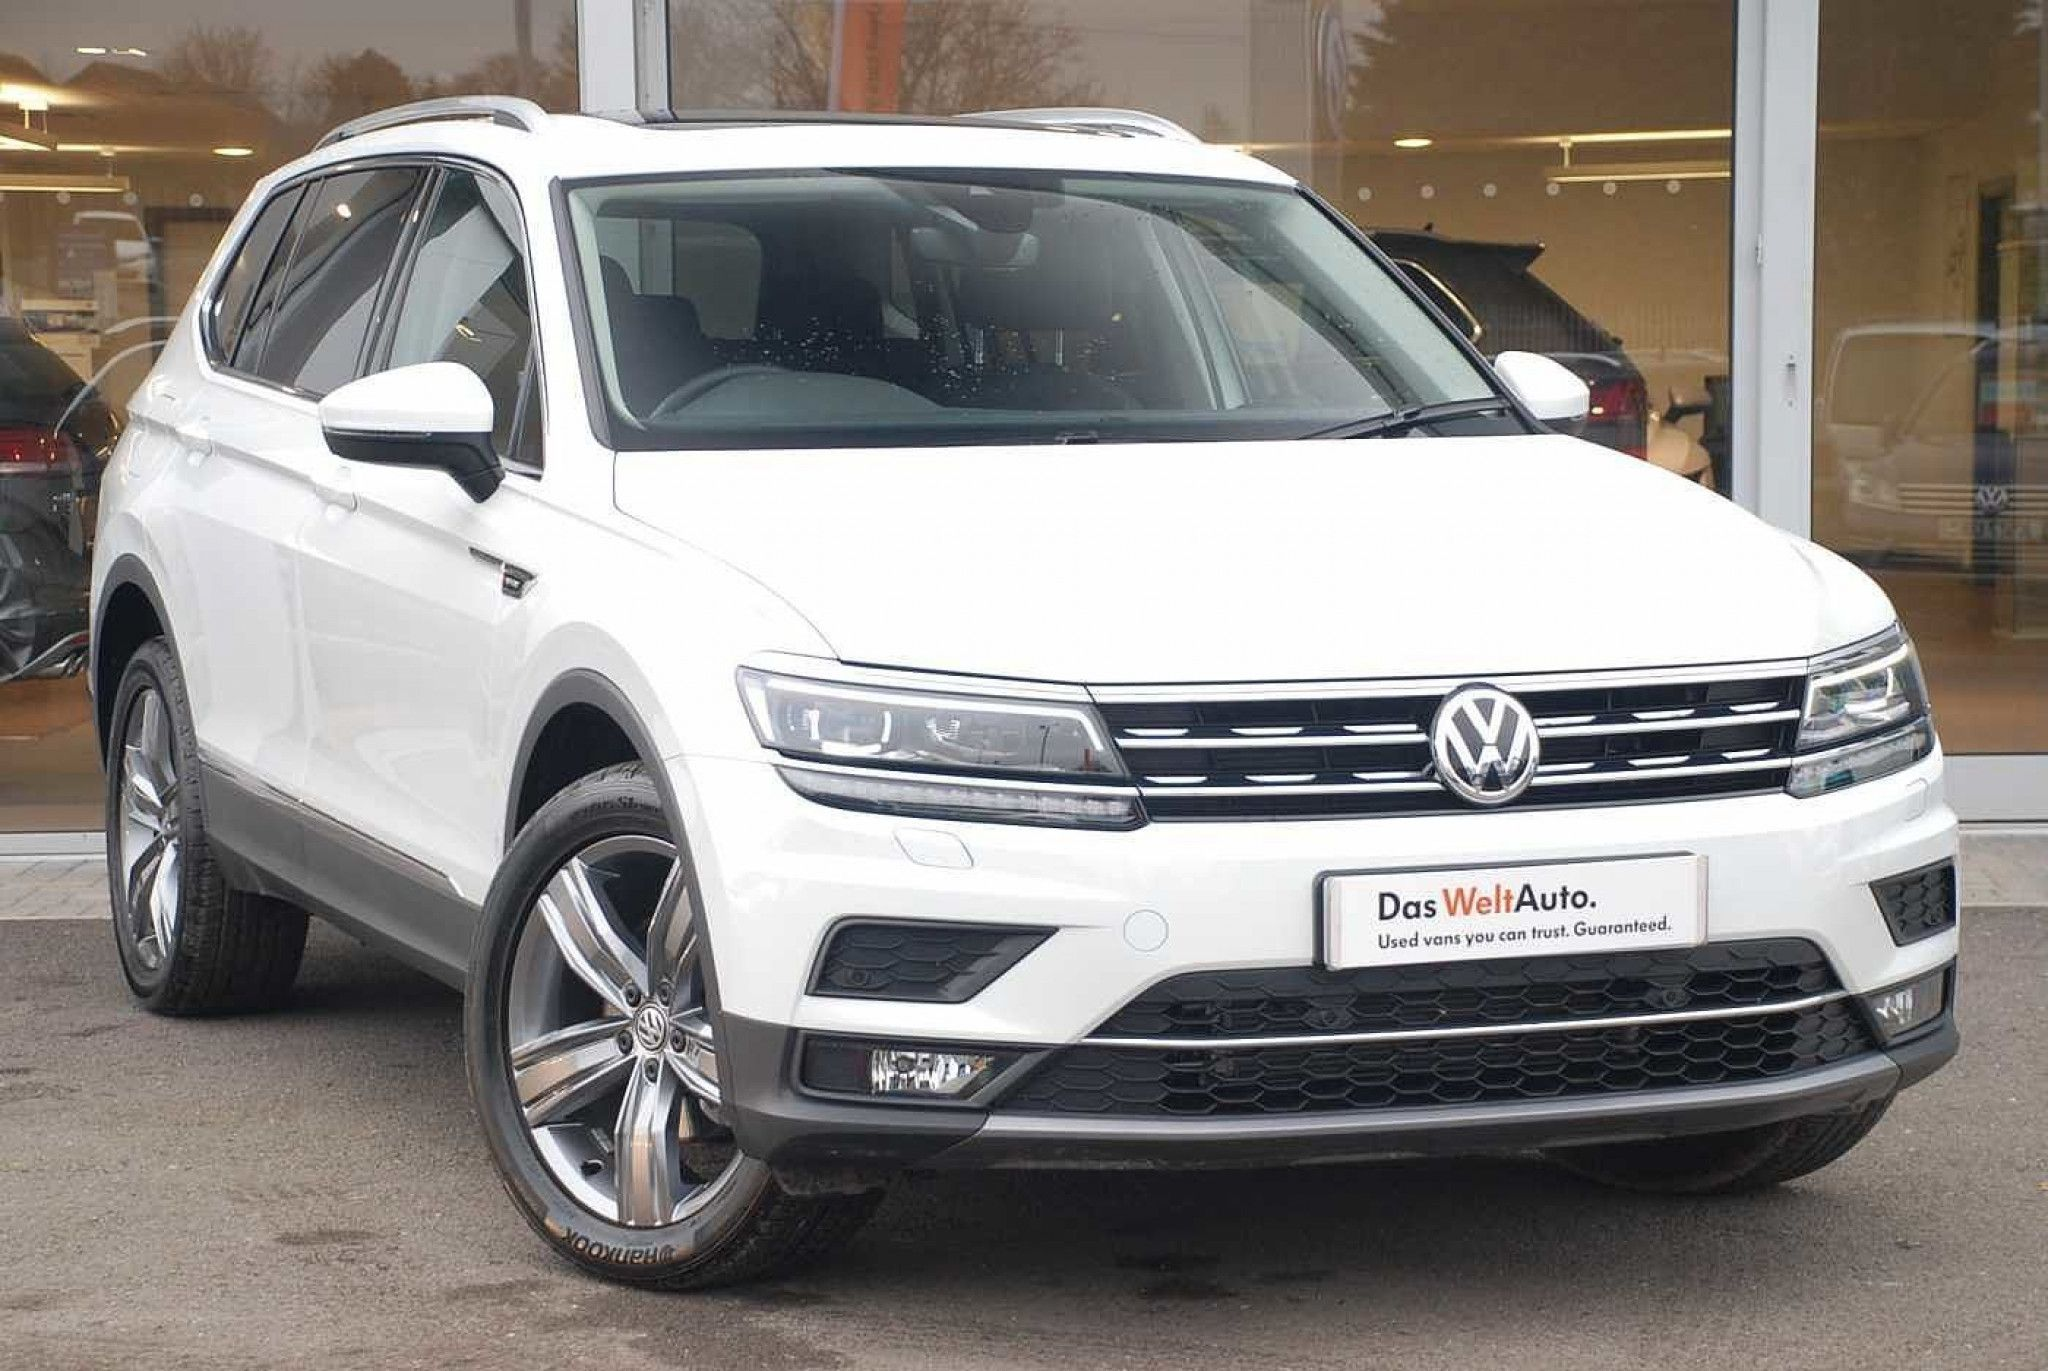 Volkswagen Tiguan Allspace 2 0 Tdi 4motion Sel 5dr Dsg In 2020 Volkswagen Volkswagen Jetta Tdi